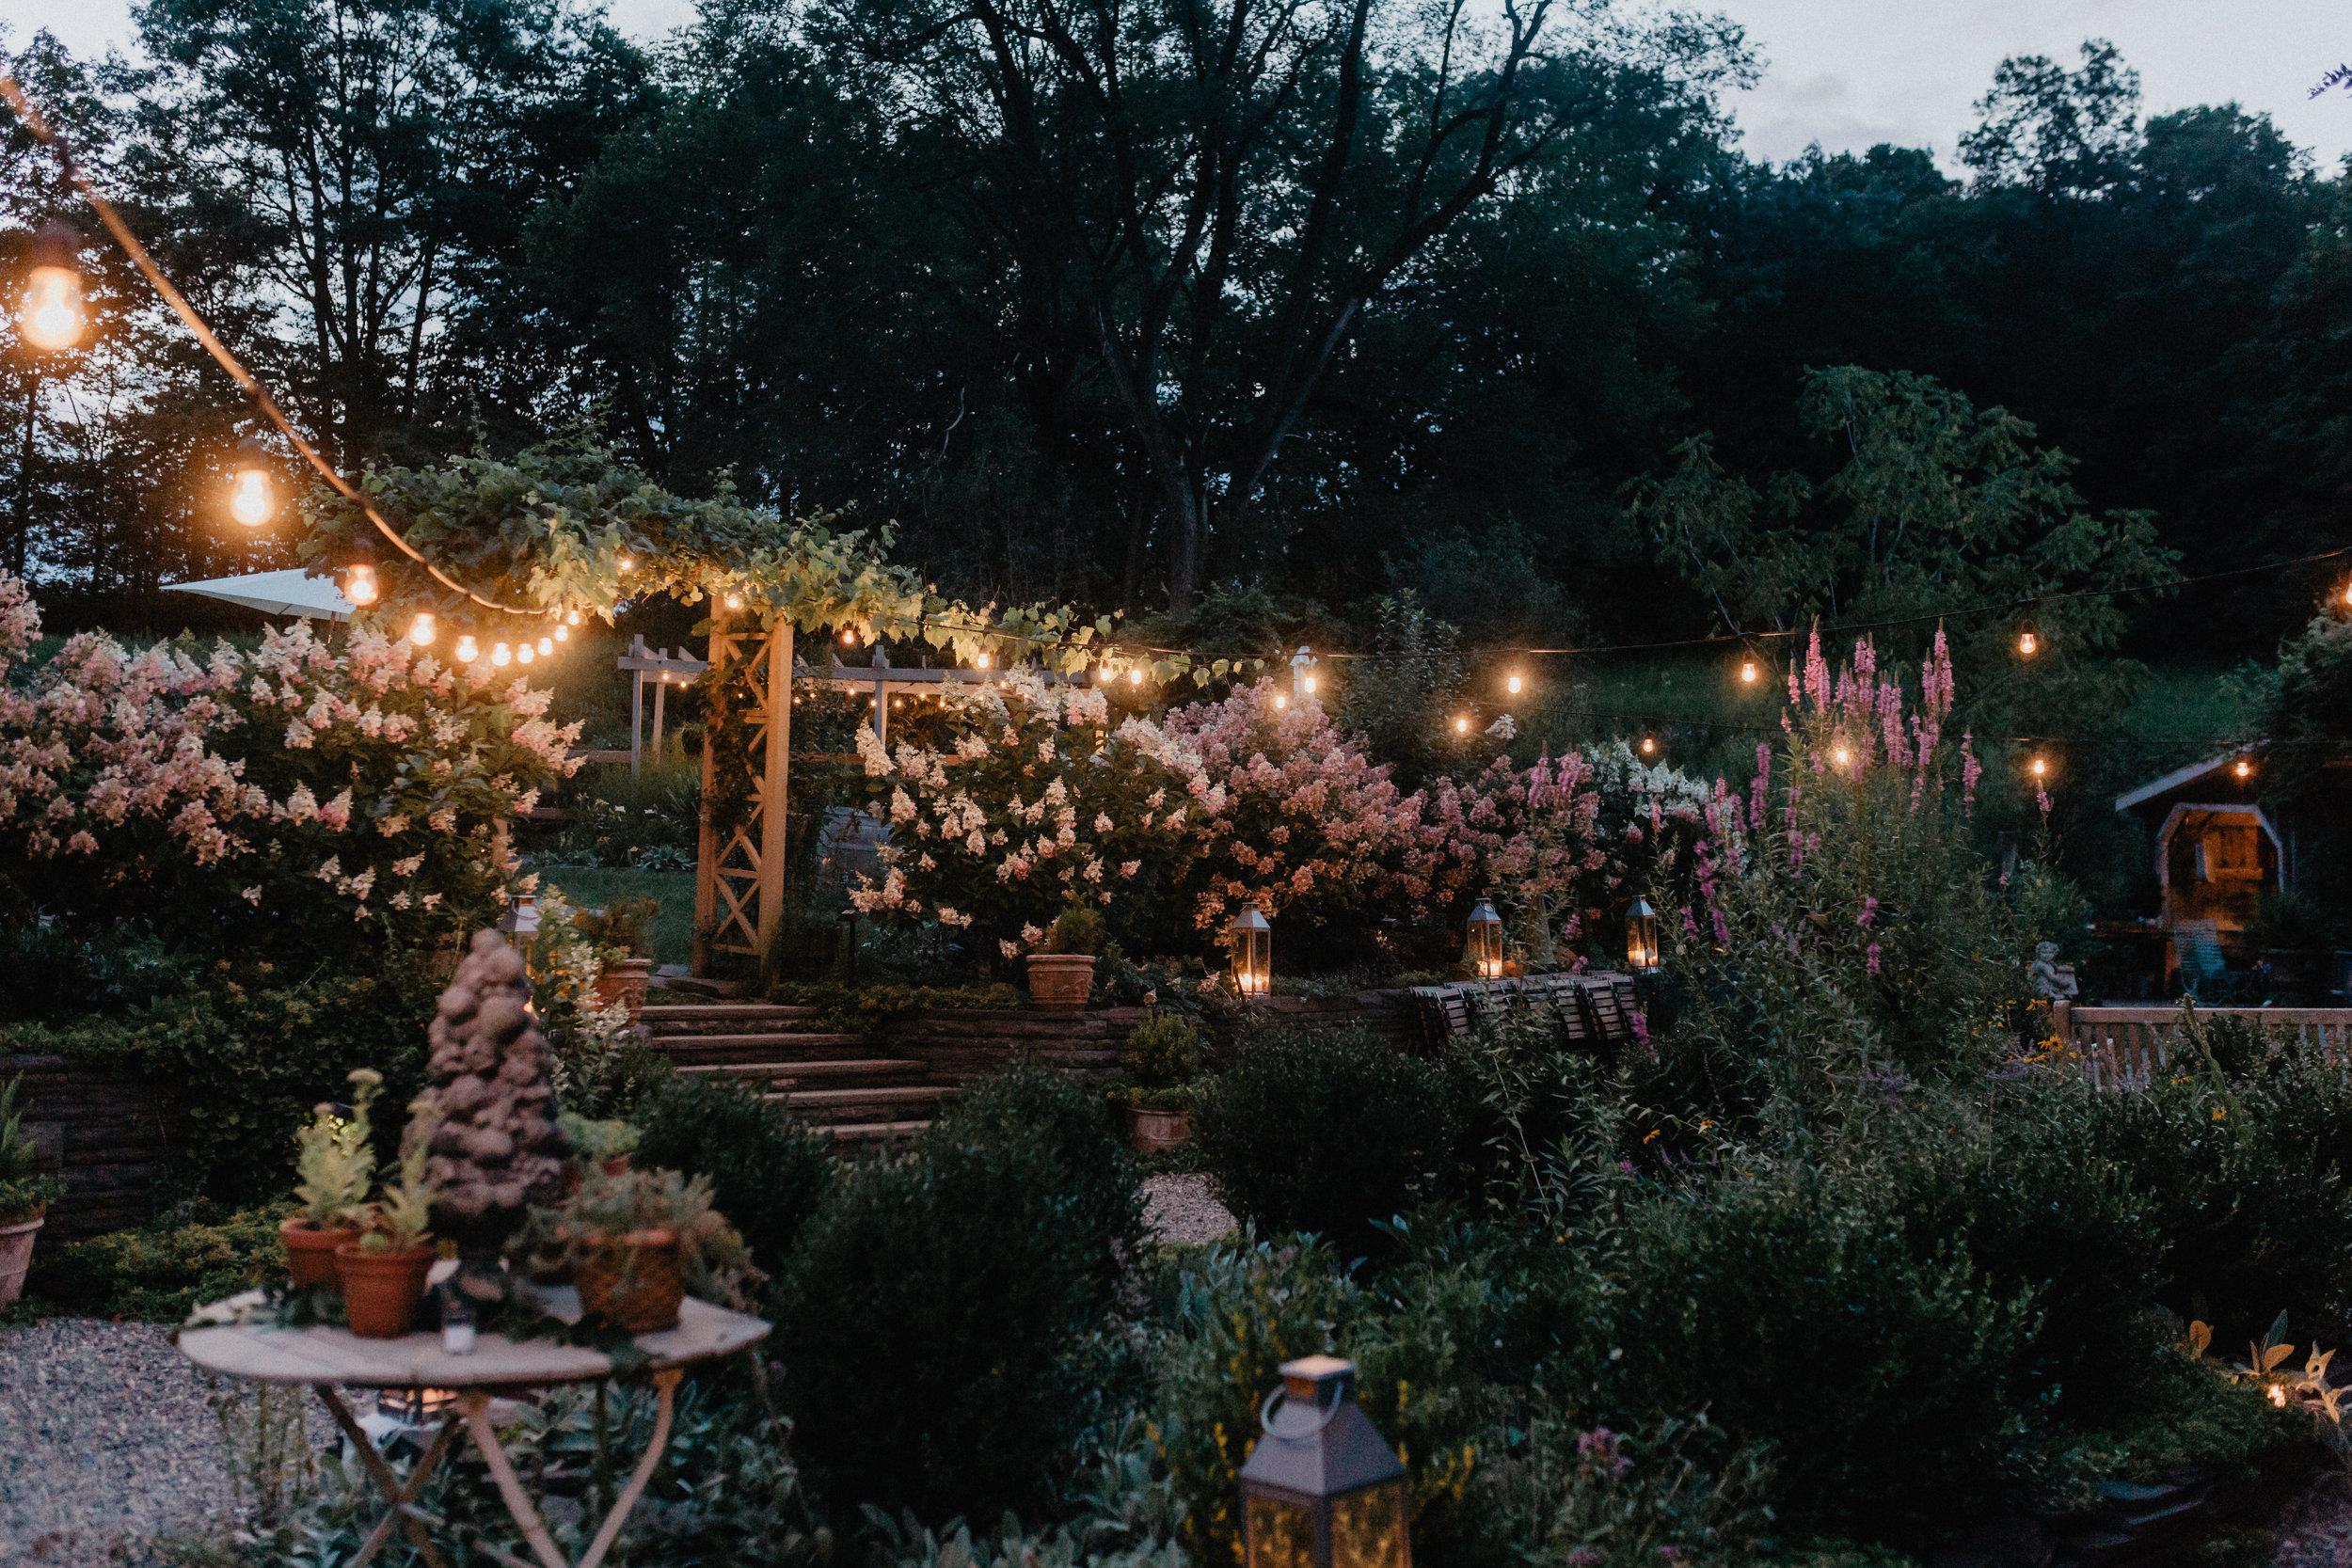 m-and-d-farm-wedding-119.jpg